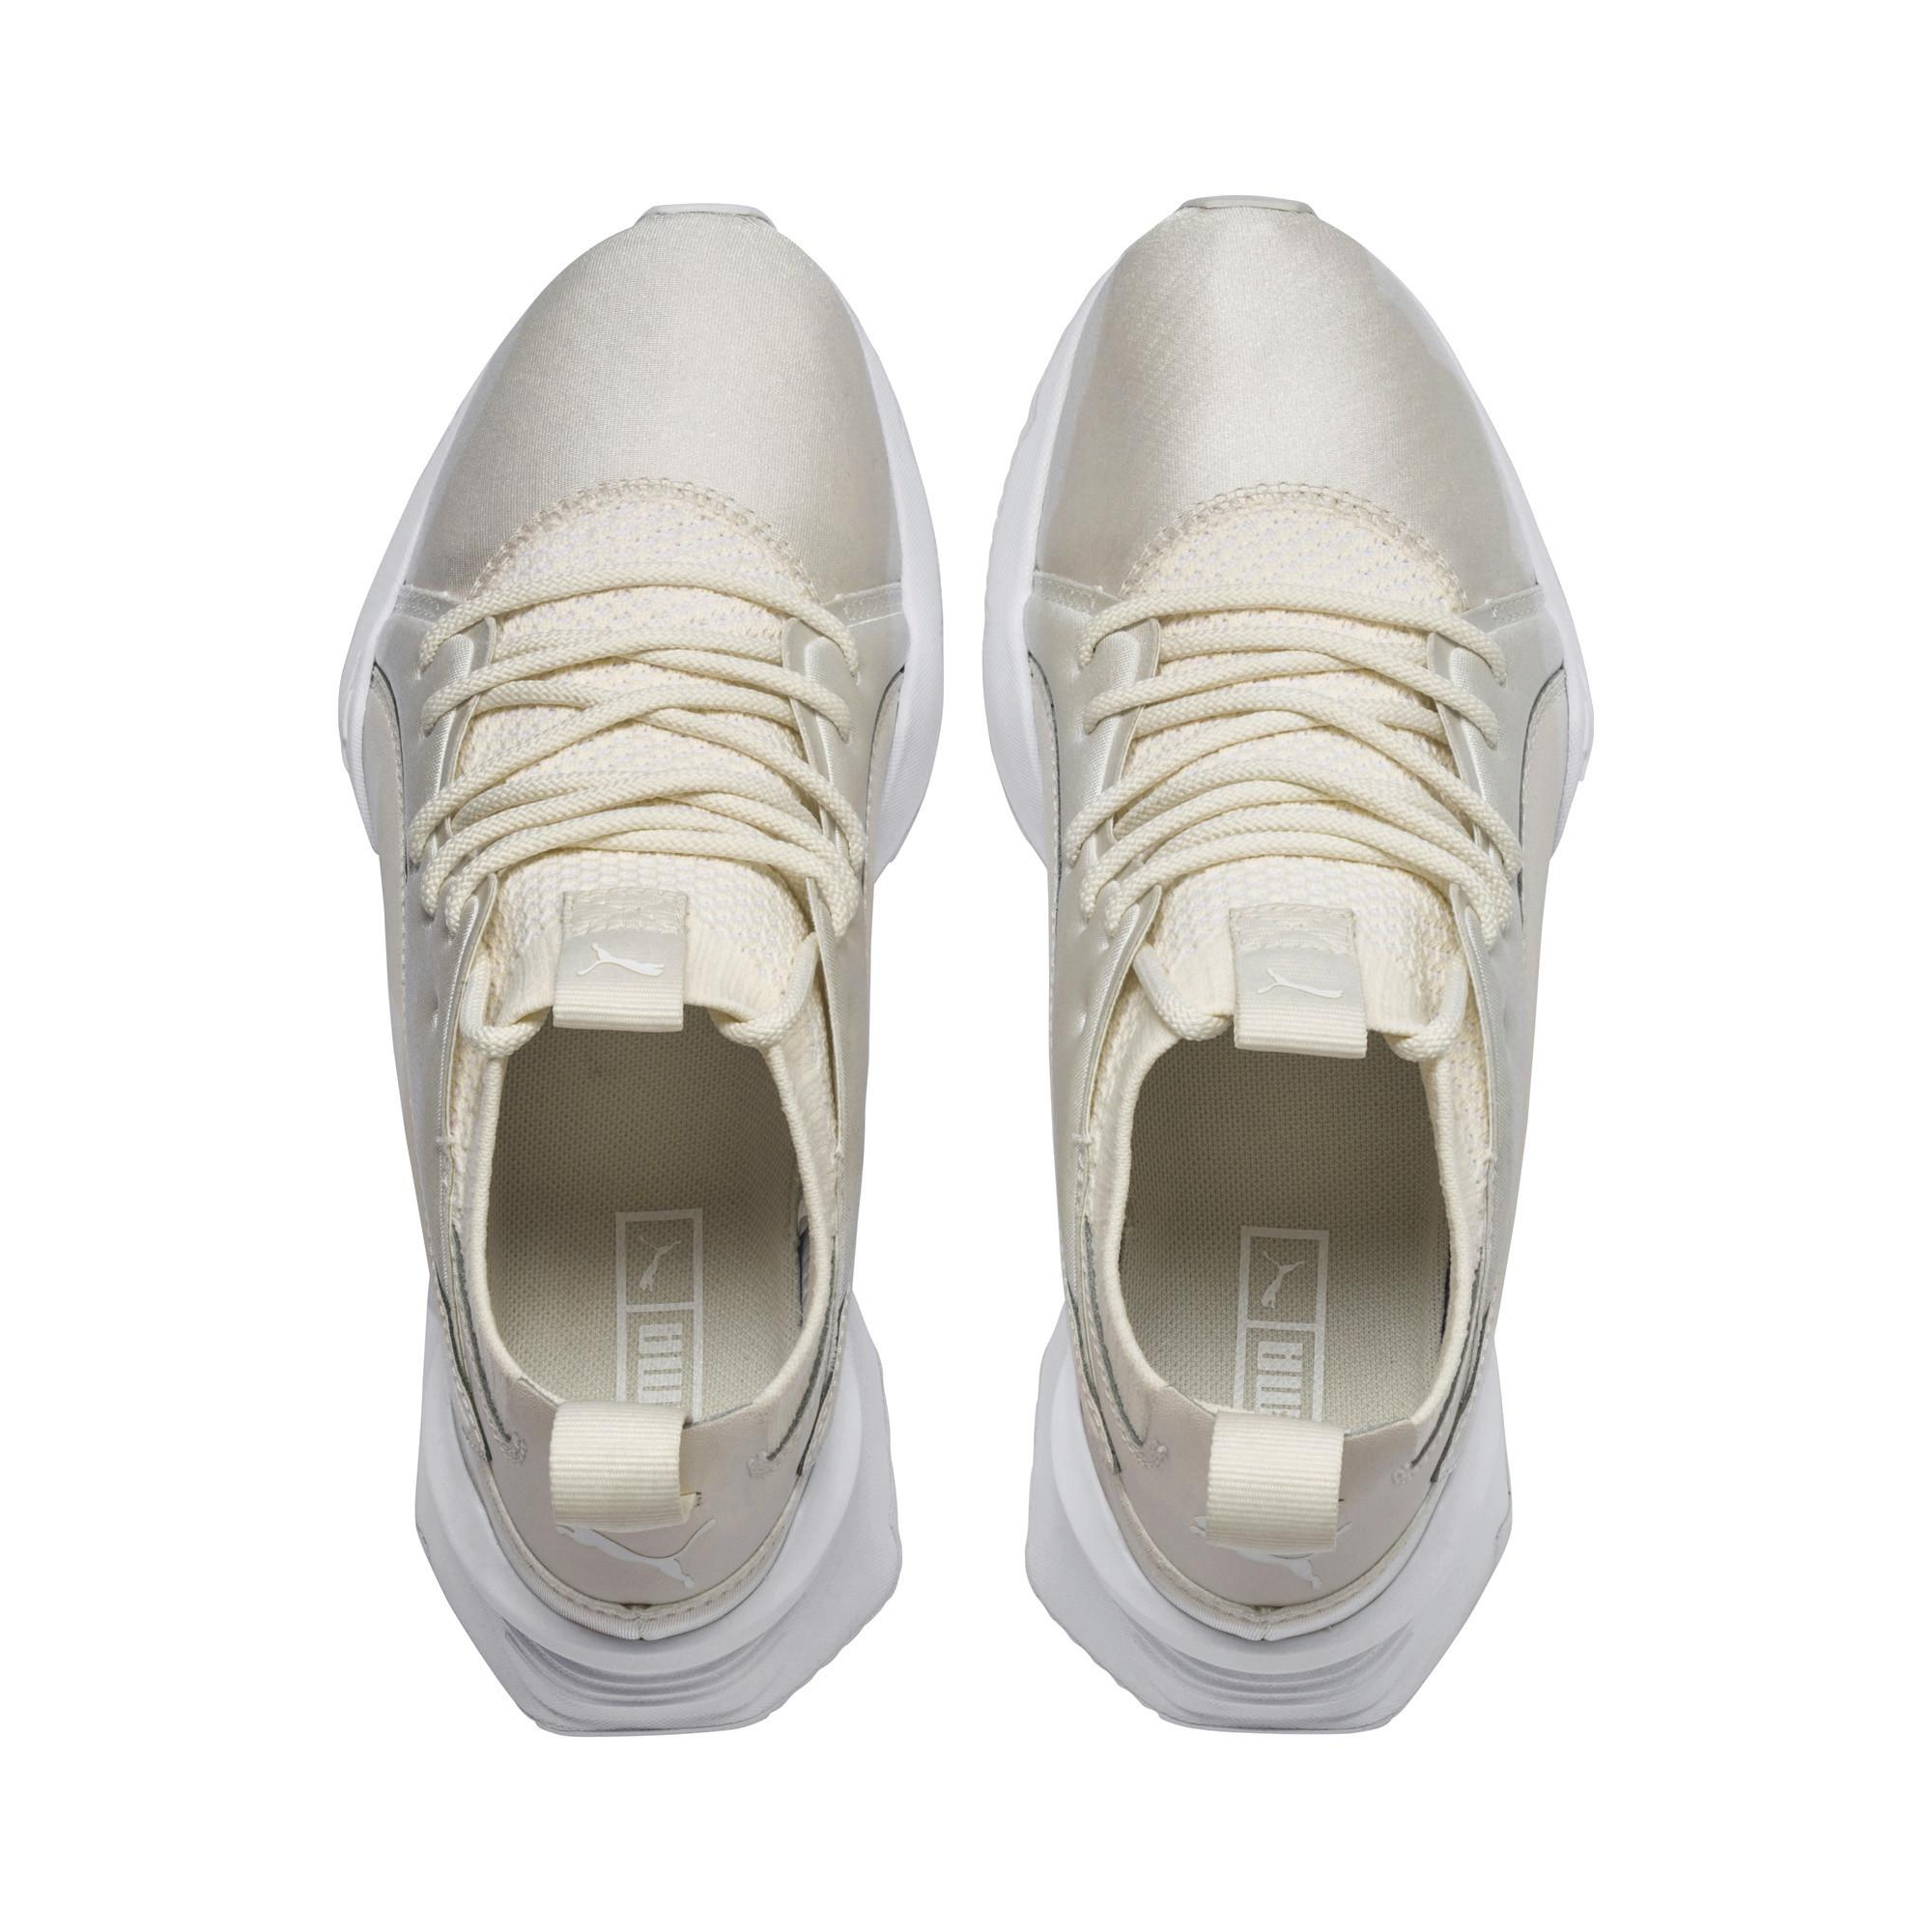 PUMA - White Muse Maia Knit Premium Women s Shoes - Lyst. View fullscreen a3742629a